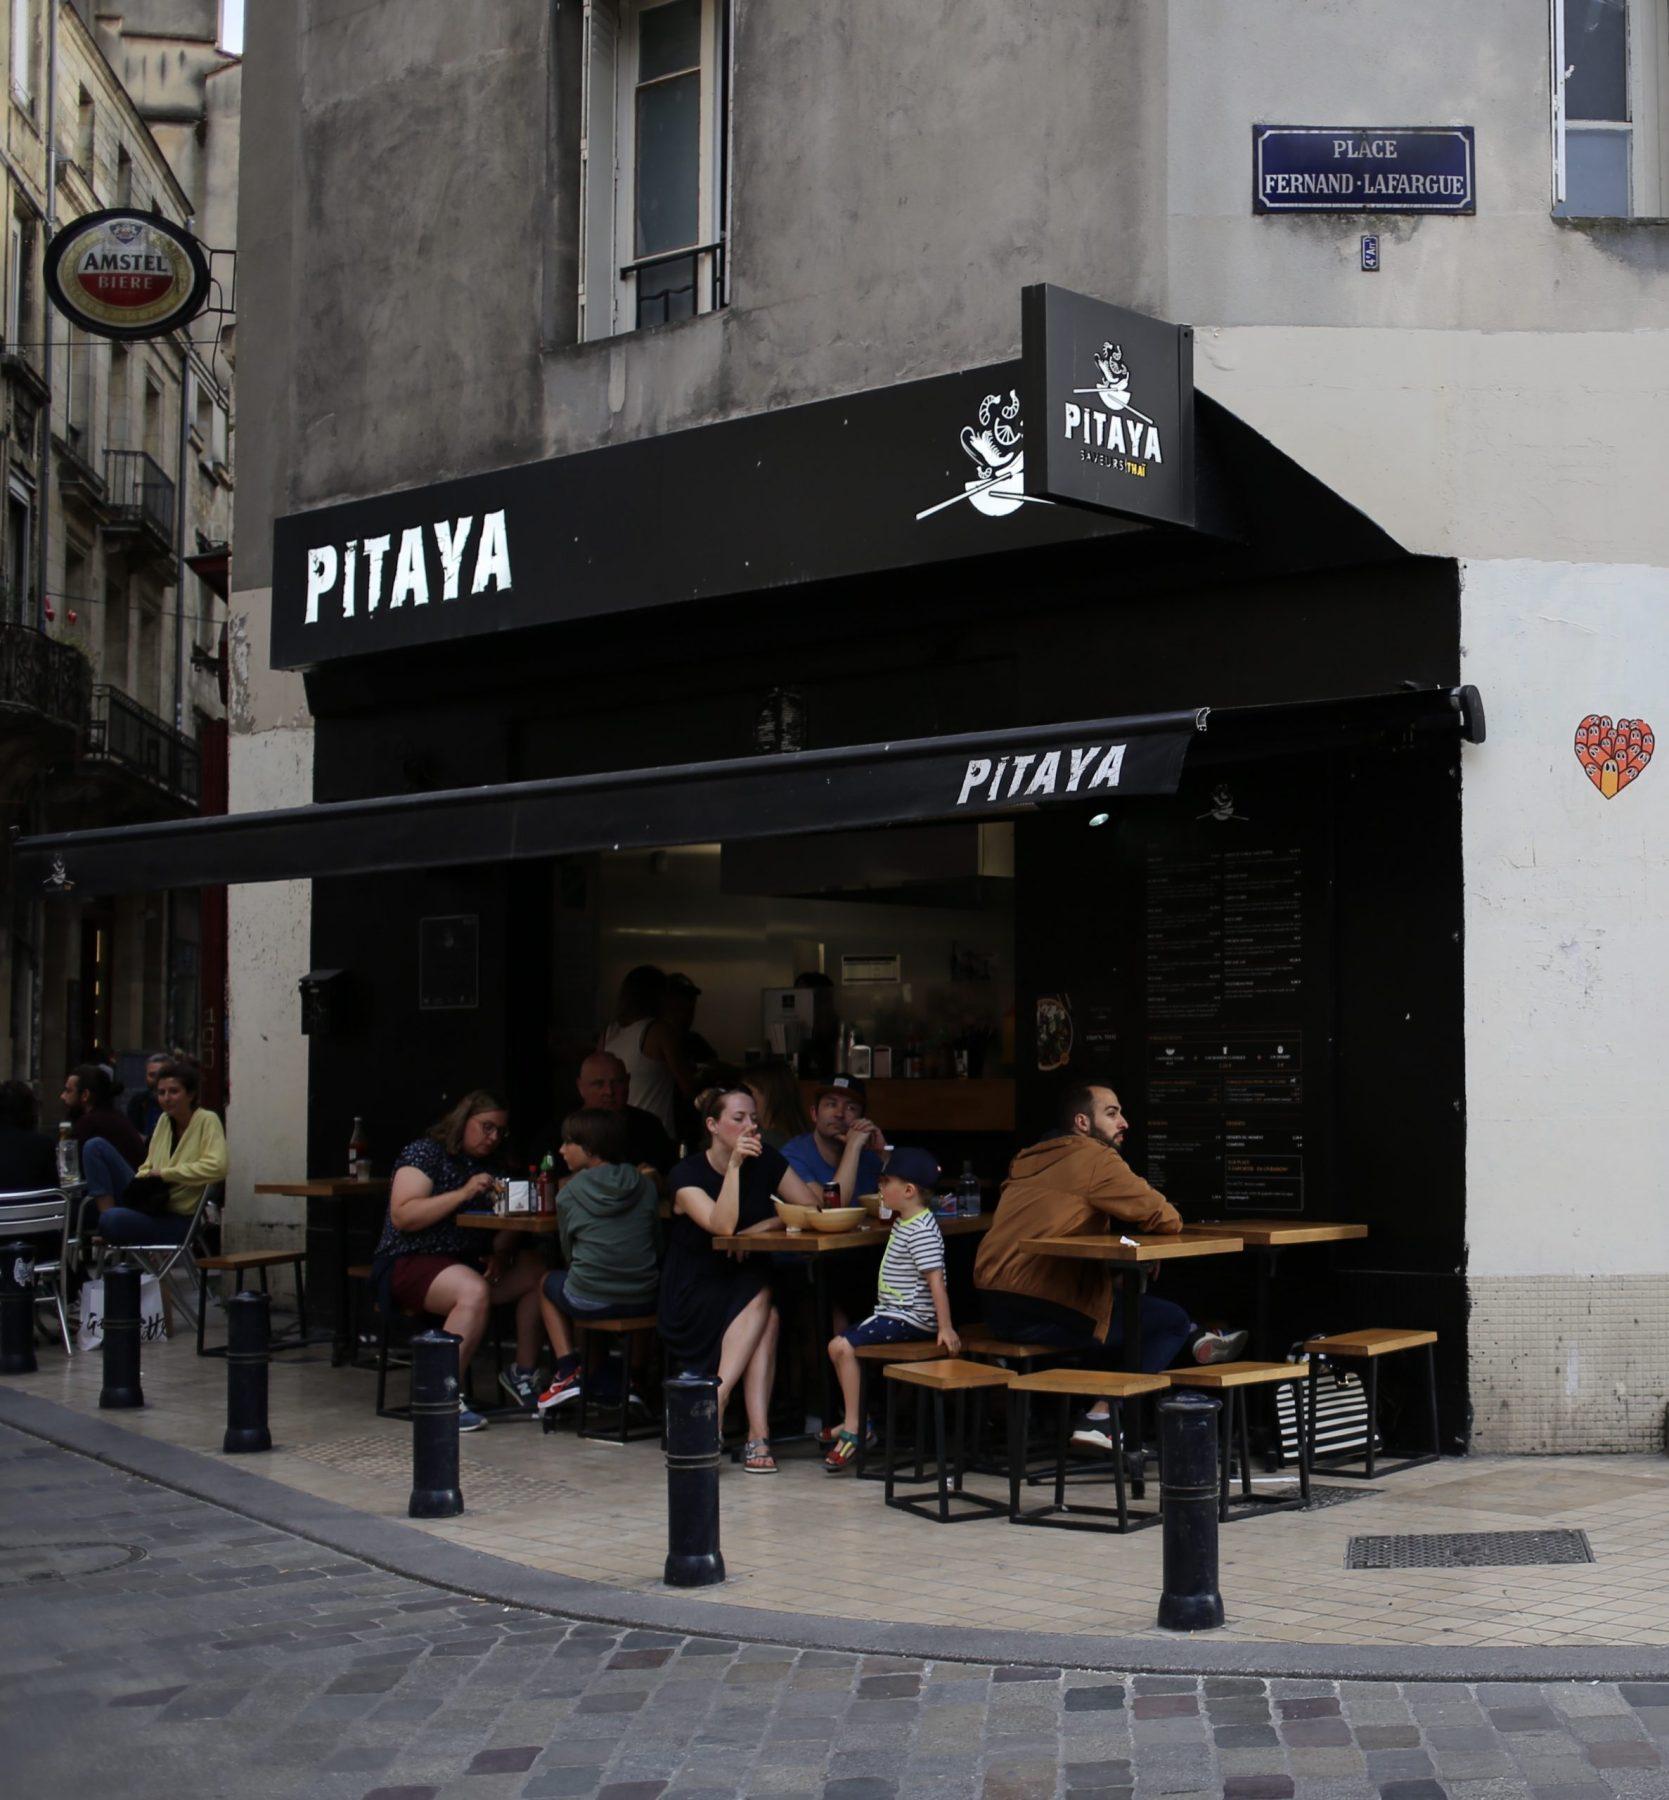 Pitaya, Place Fernand-Lafargue, Bordeaux, France